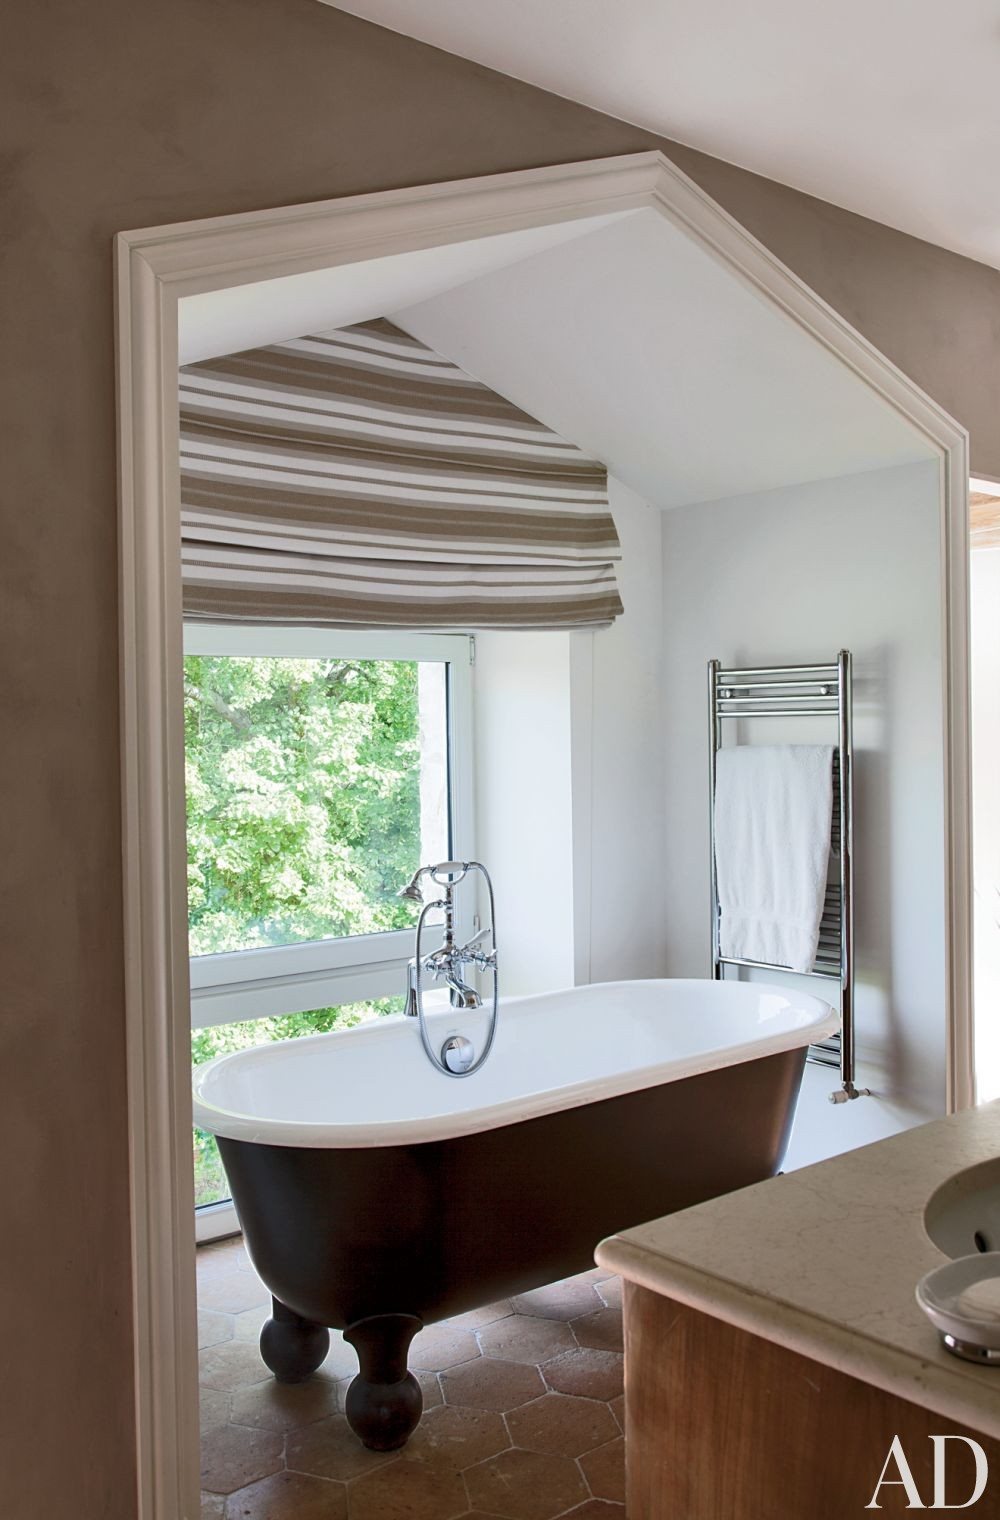 Rustic Bathroom by Jean-Louis Deniot in Loire Valley, France